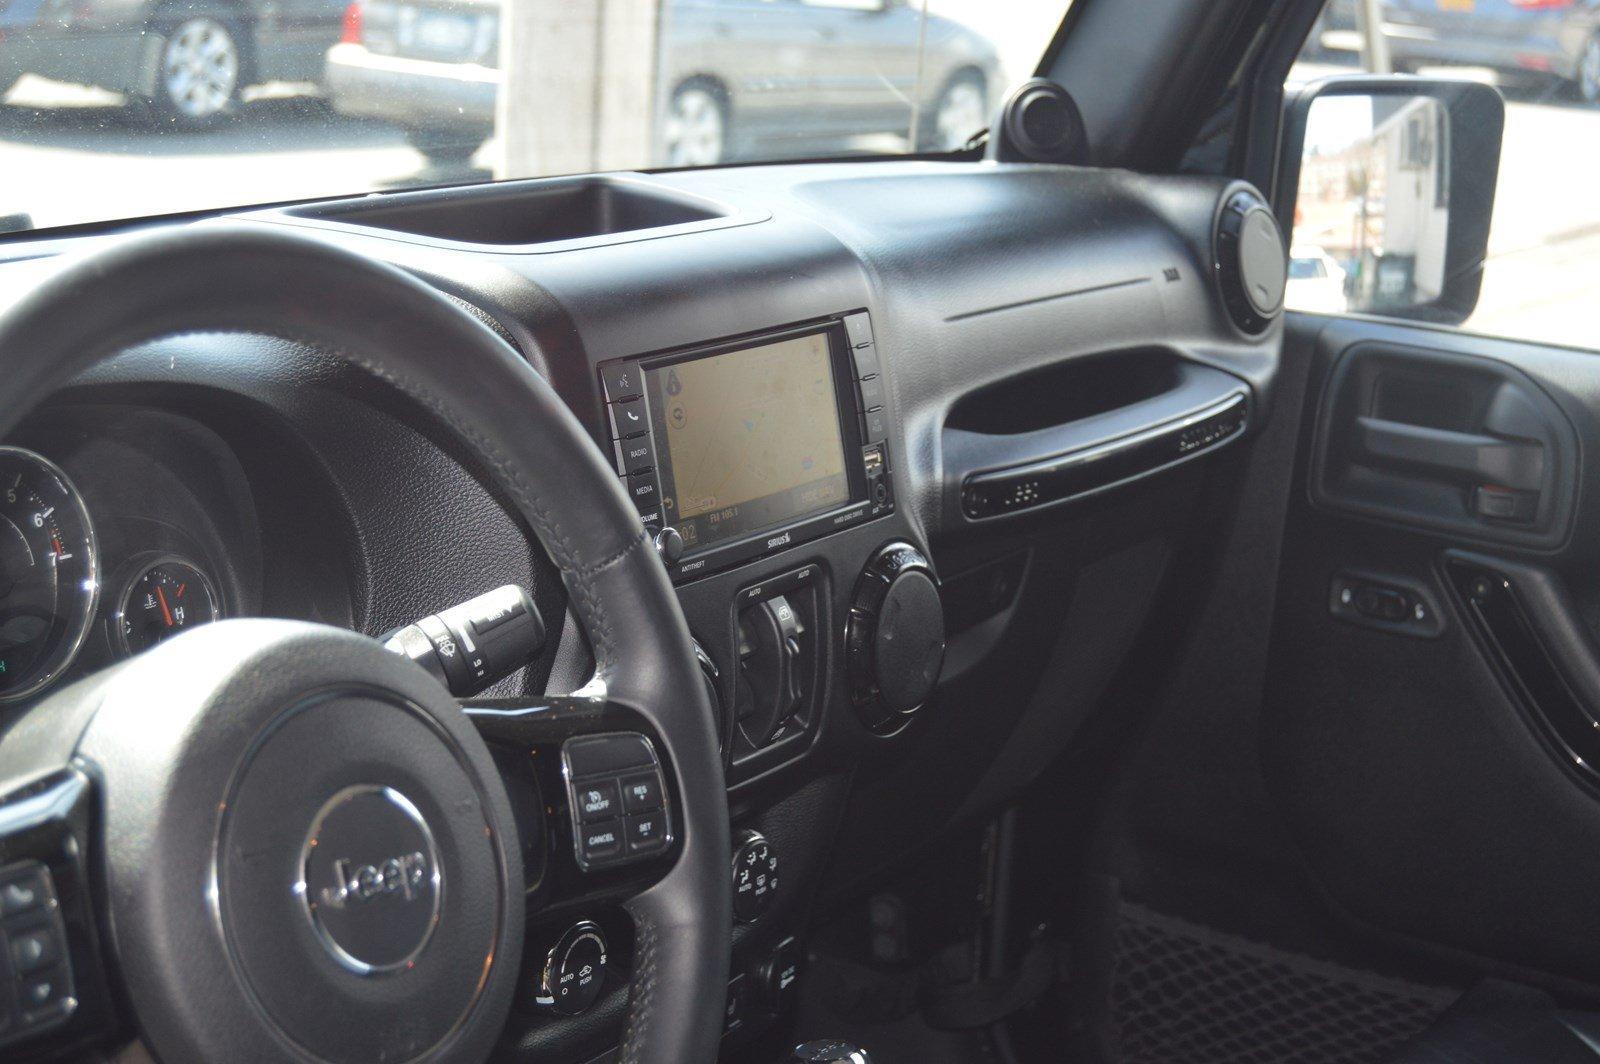 Used-2014-Jeep-Wrangler-Unlimited-Sahara-(Navi,-Leather)